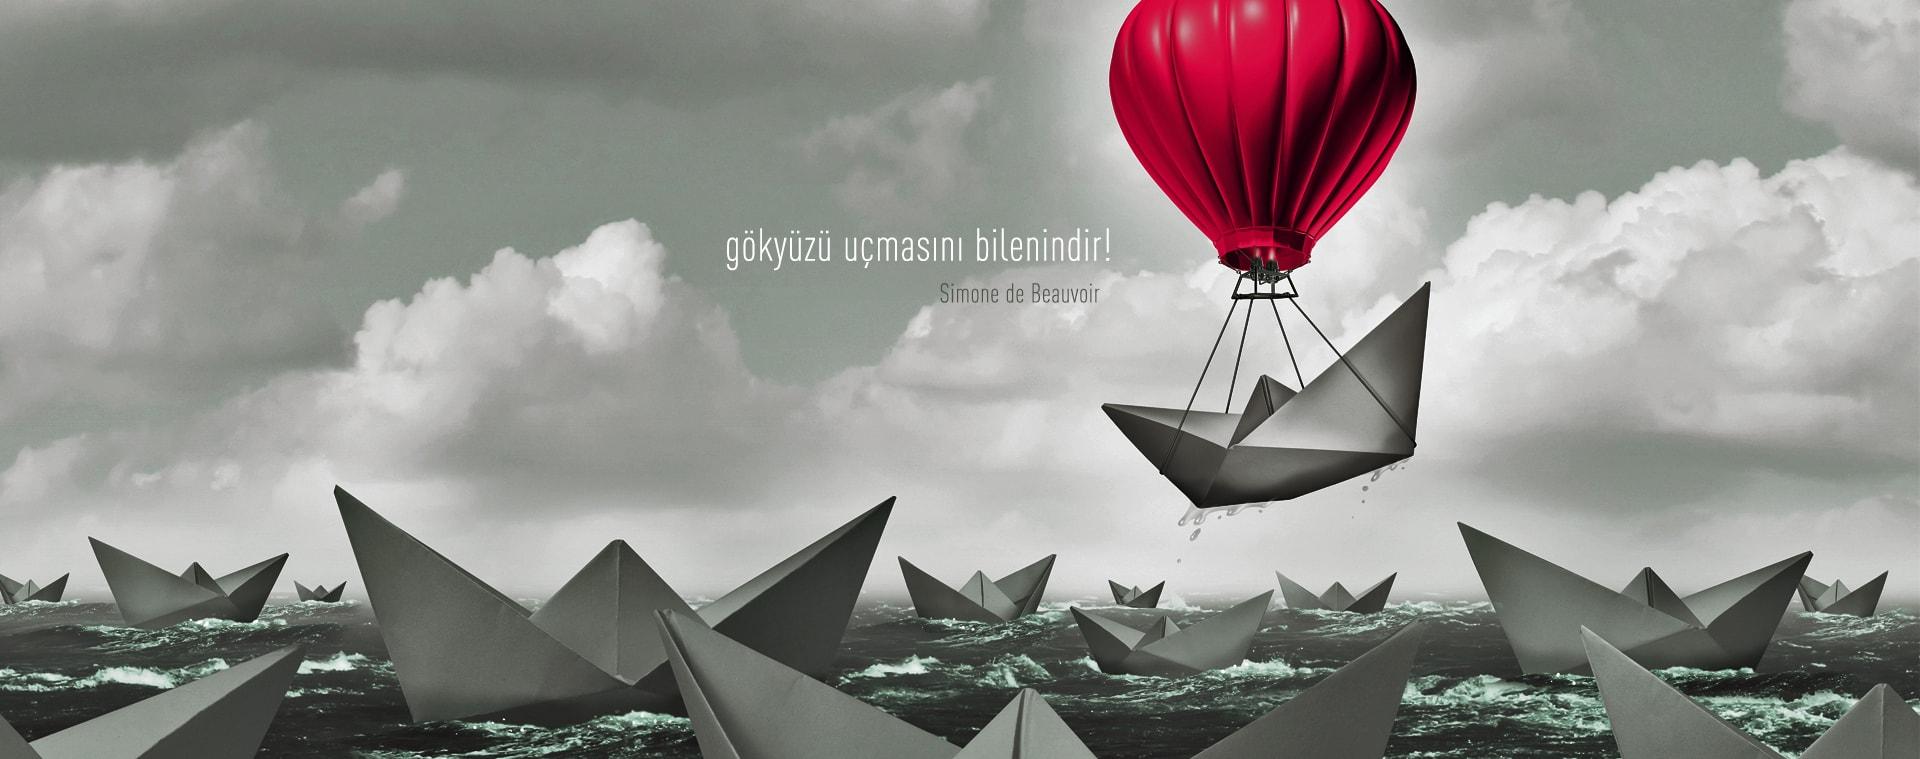 ilustrasyon_tasarim-min